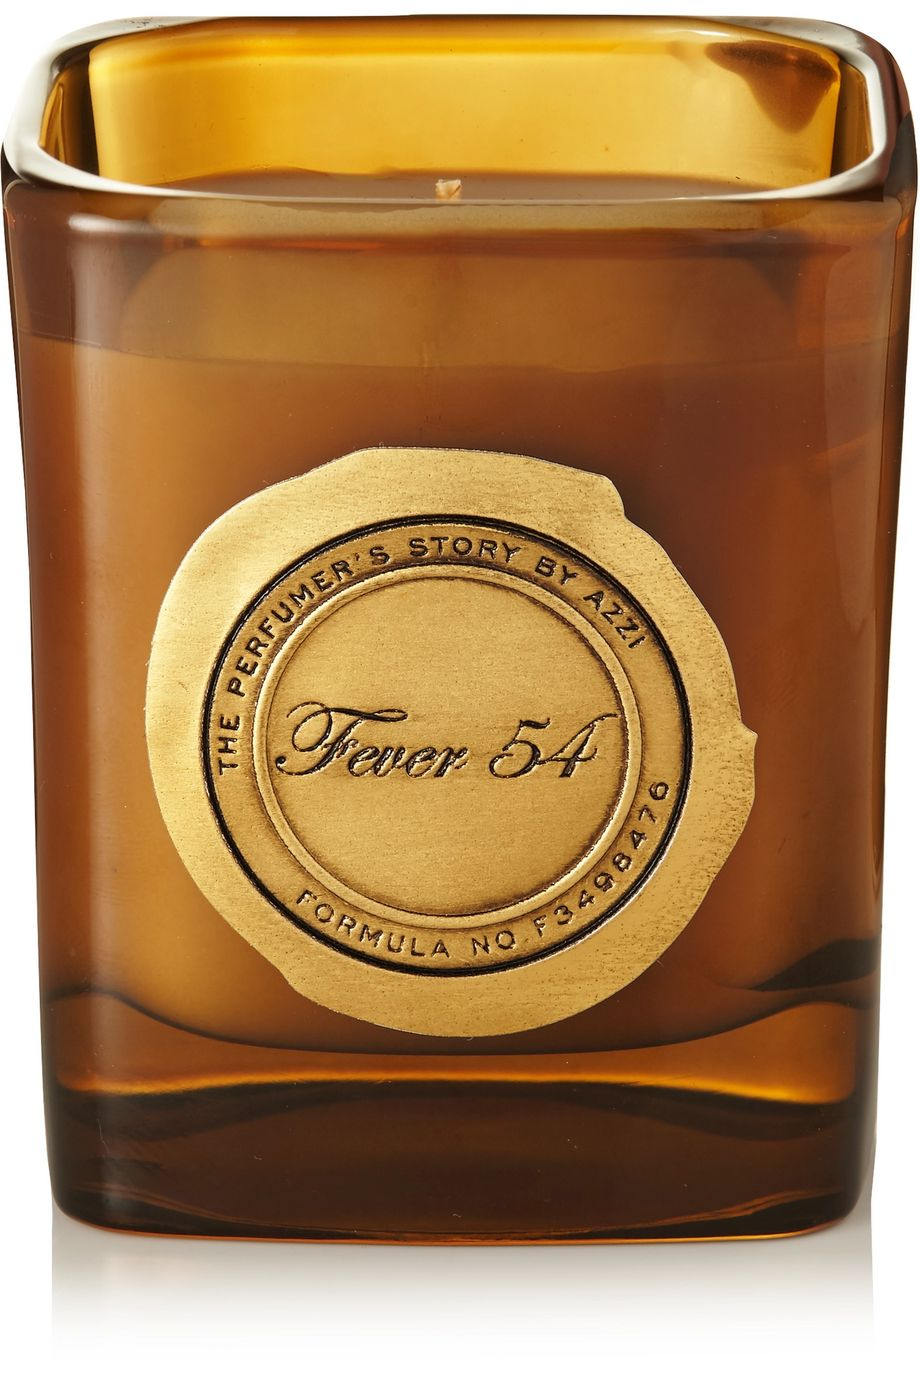 The Perfumer's Story by Azzi Glasser Fever 54 香氛蜡烛,180g